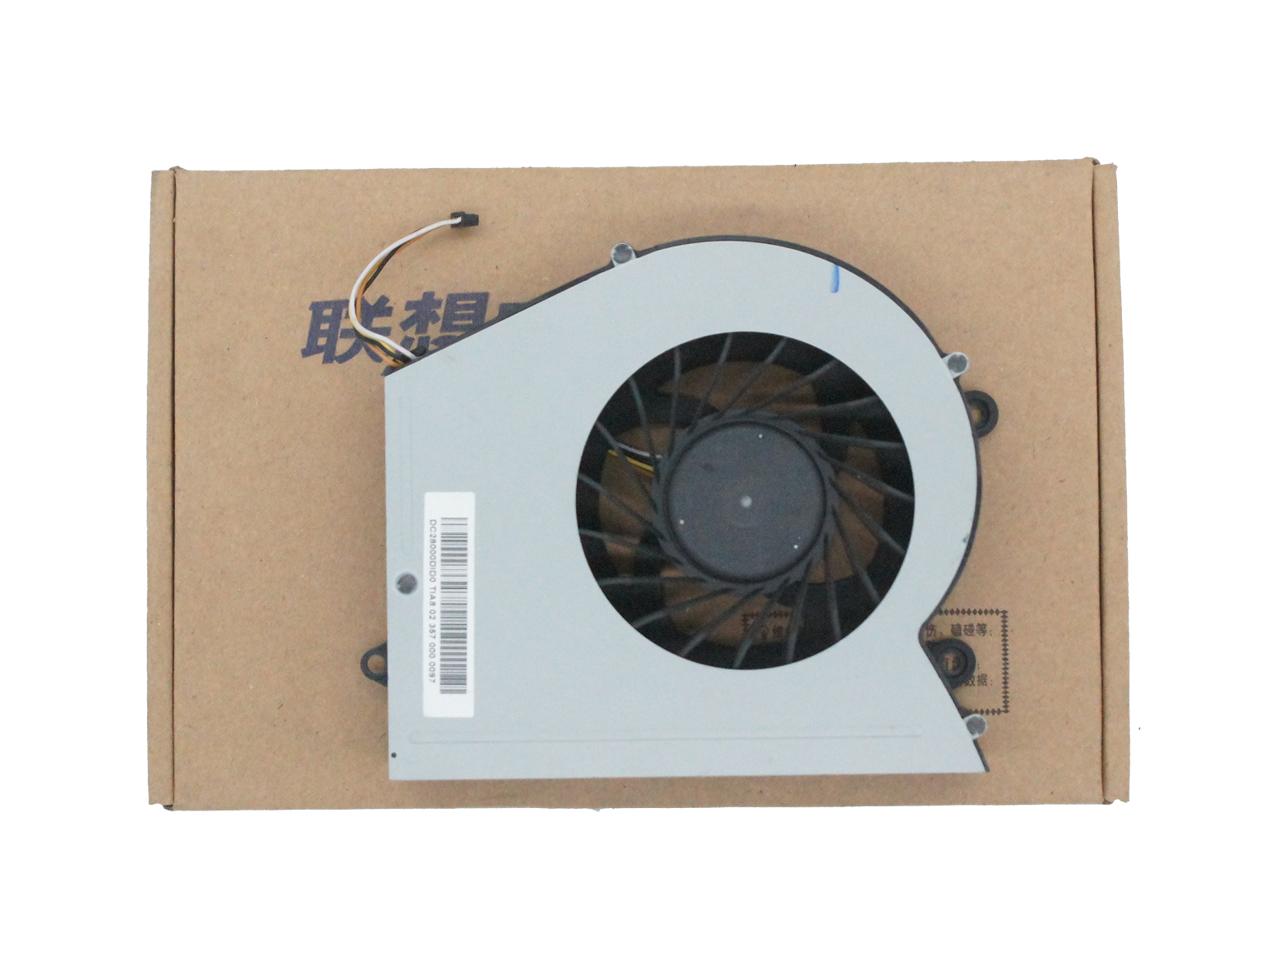 DC28000DID0 联想LENOVO C320 C340 C440 C445 C540一体机风扇 散热芯KUC1012D DC12V 0.75A